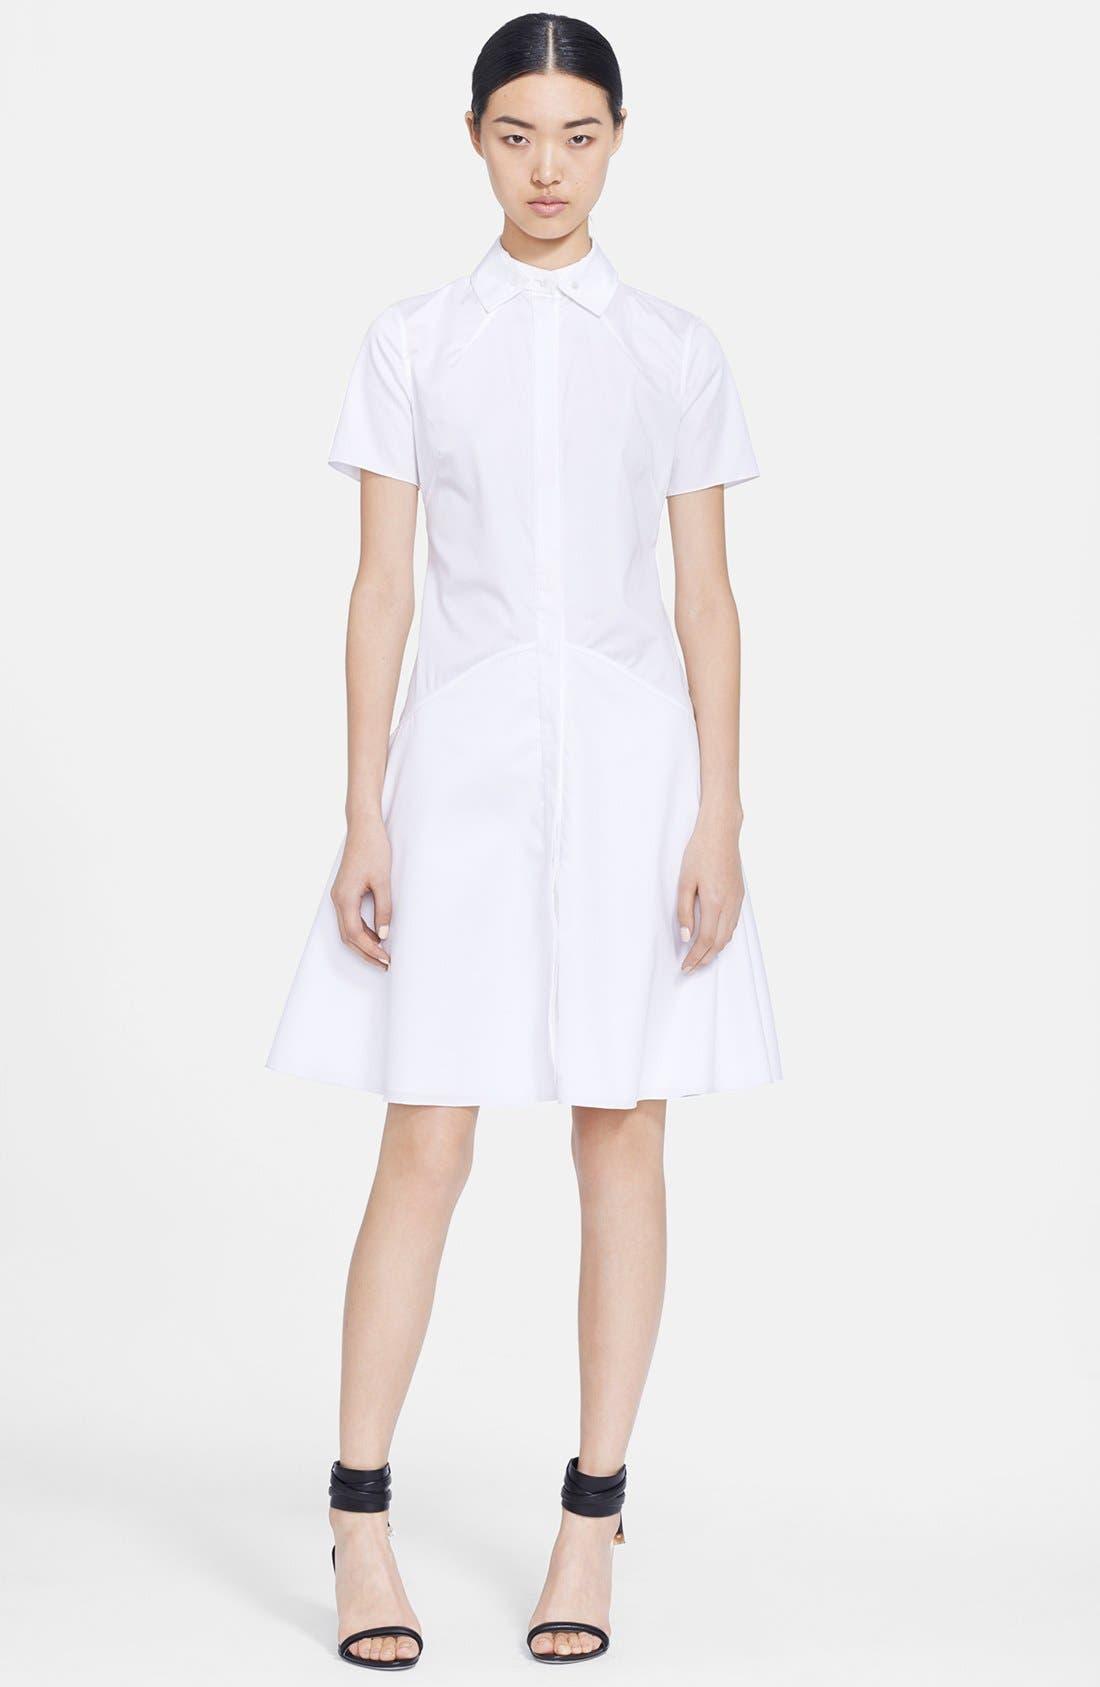 Main Image - Jason Wu Poplin Fit & Flare Shirtdress